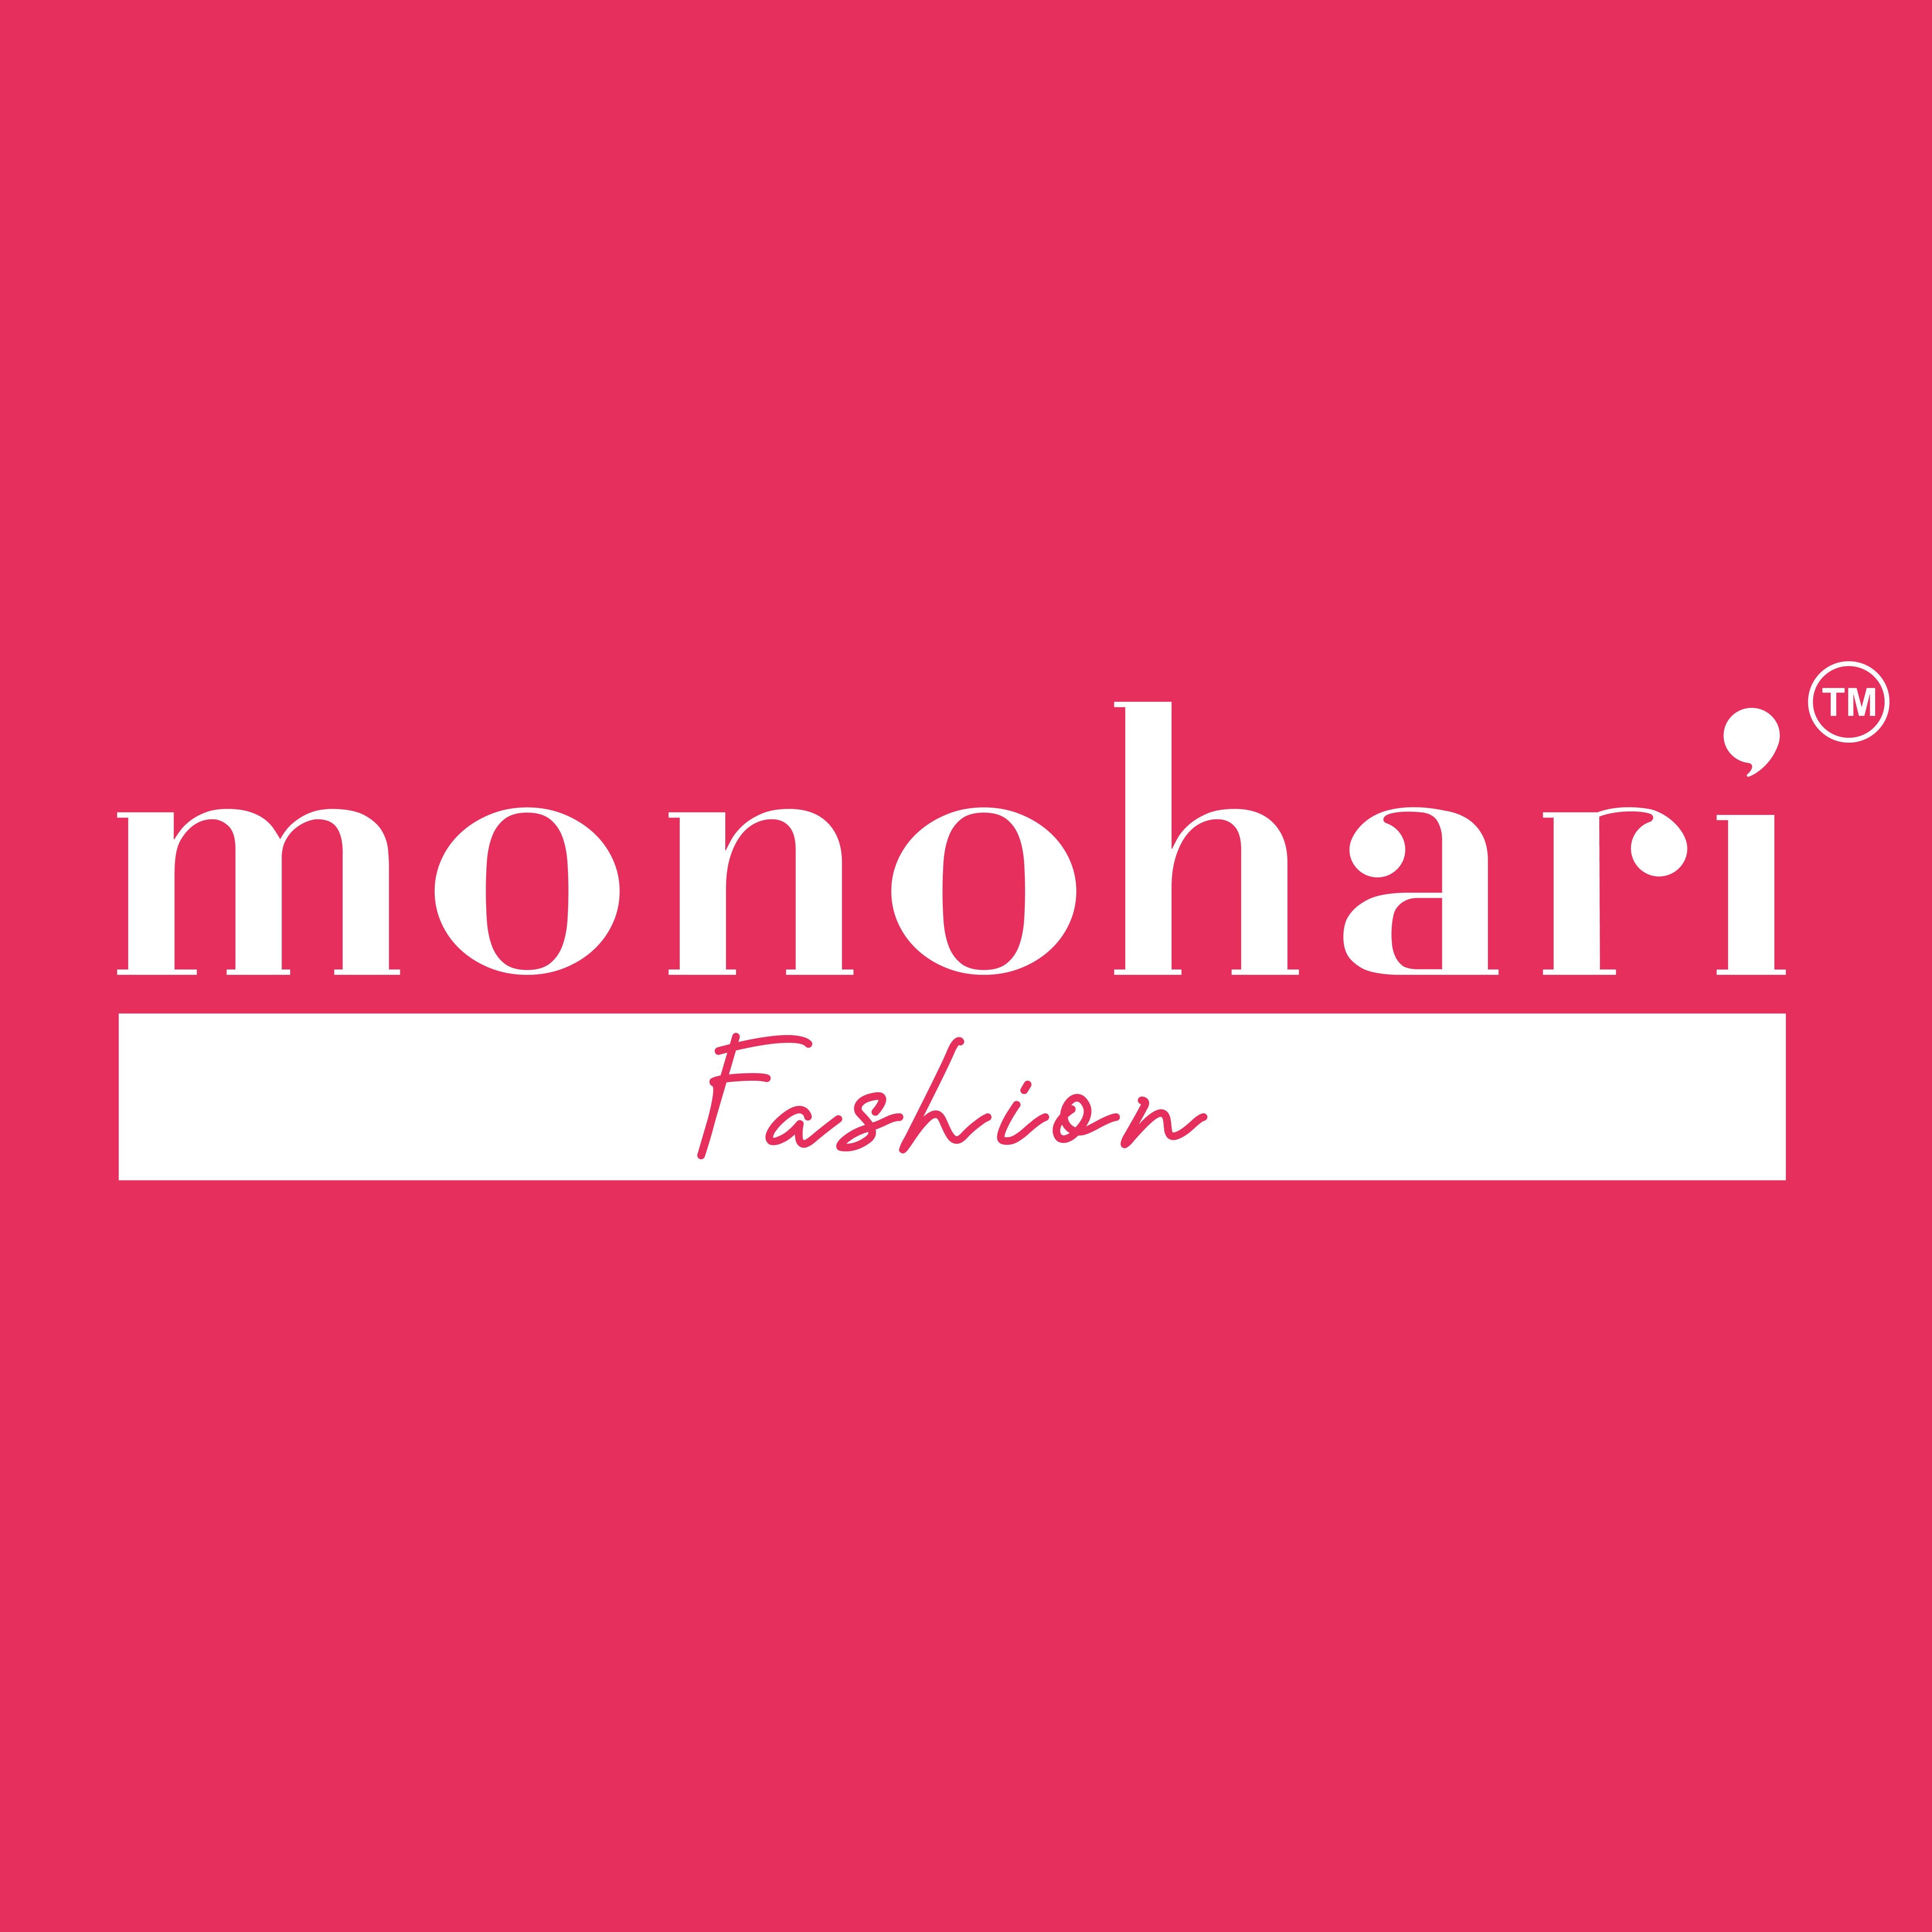 Bangladeshi Entrepreneur Tanjil Islam Announces Continuous Commitment of Monohari Fashion Clothing Brand to Women's Attire Needs